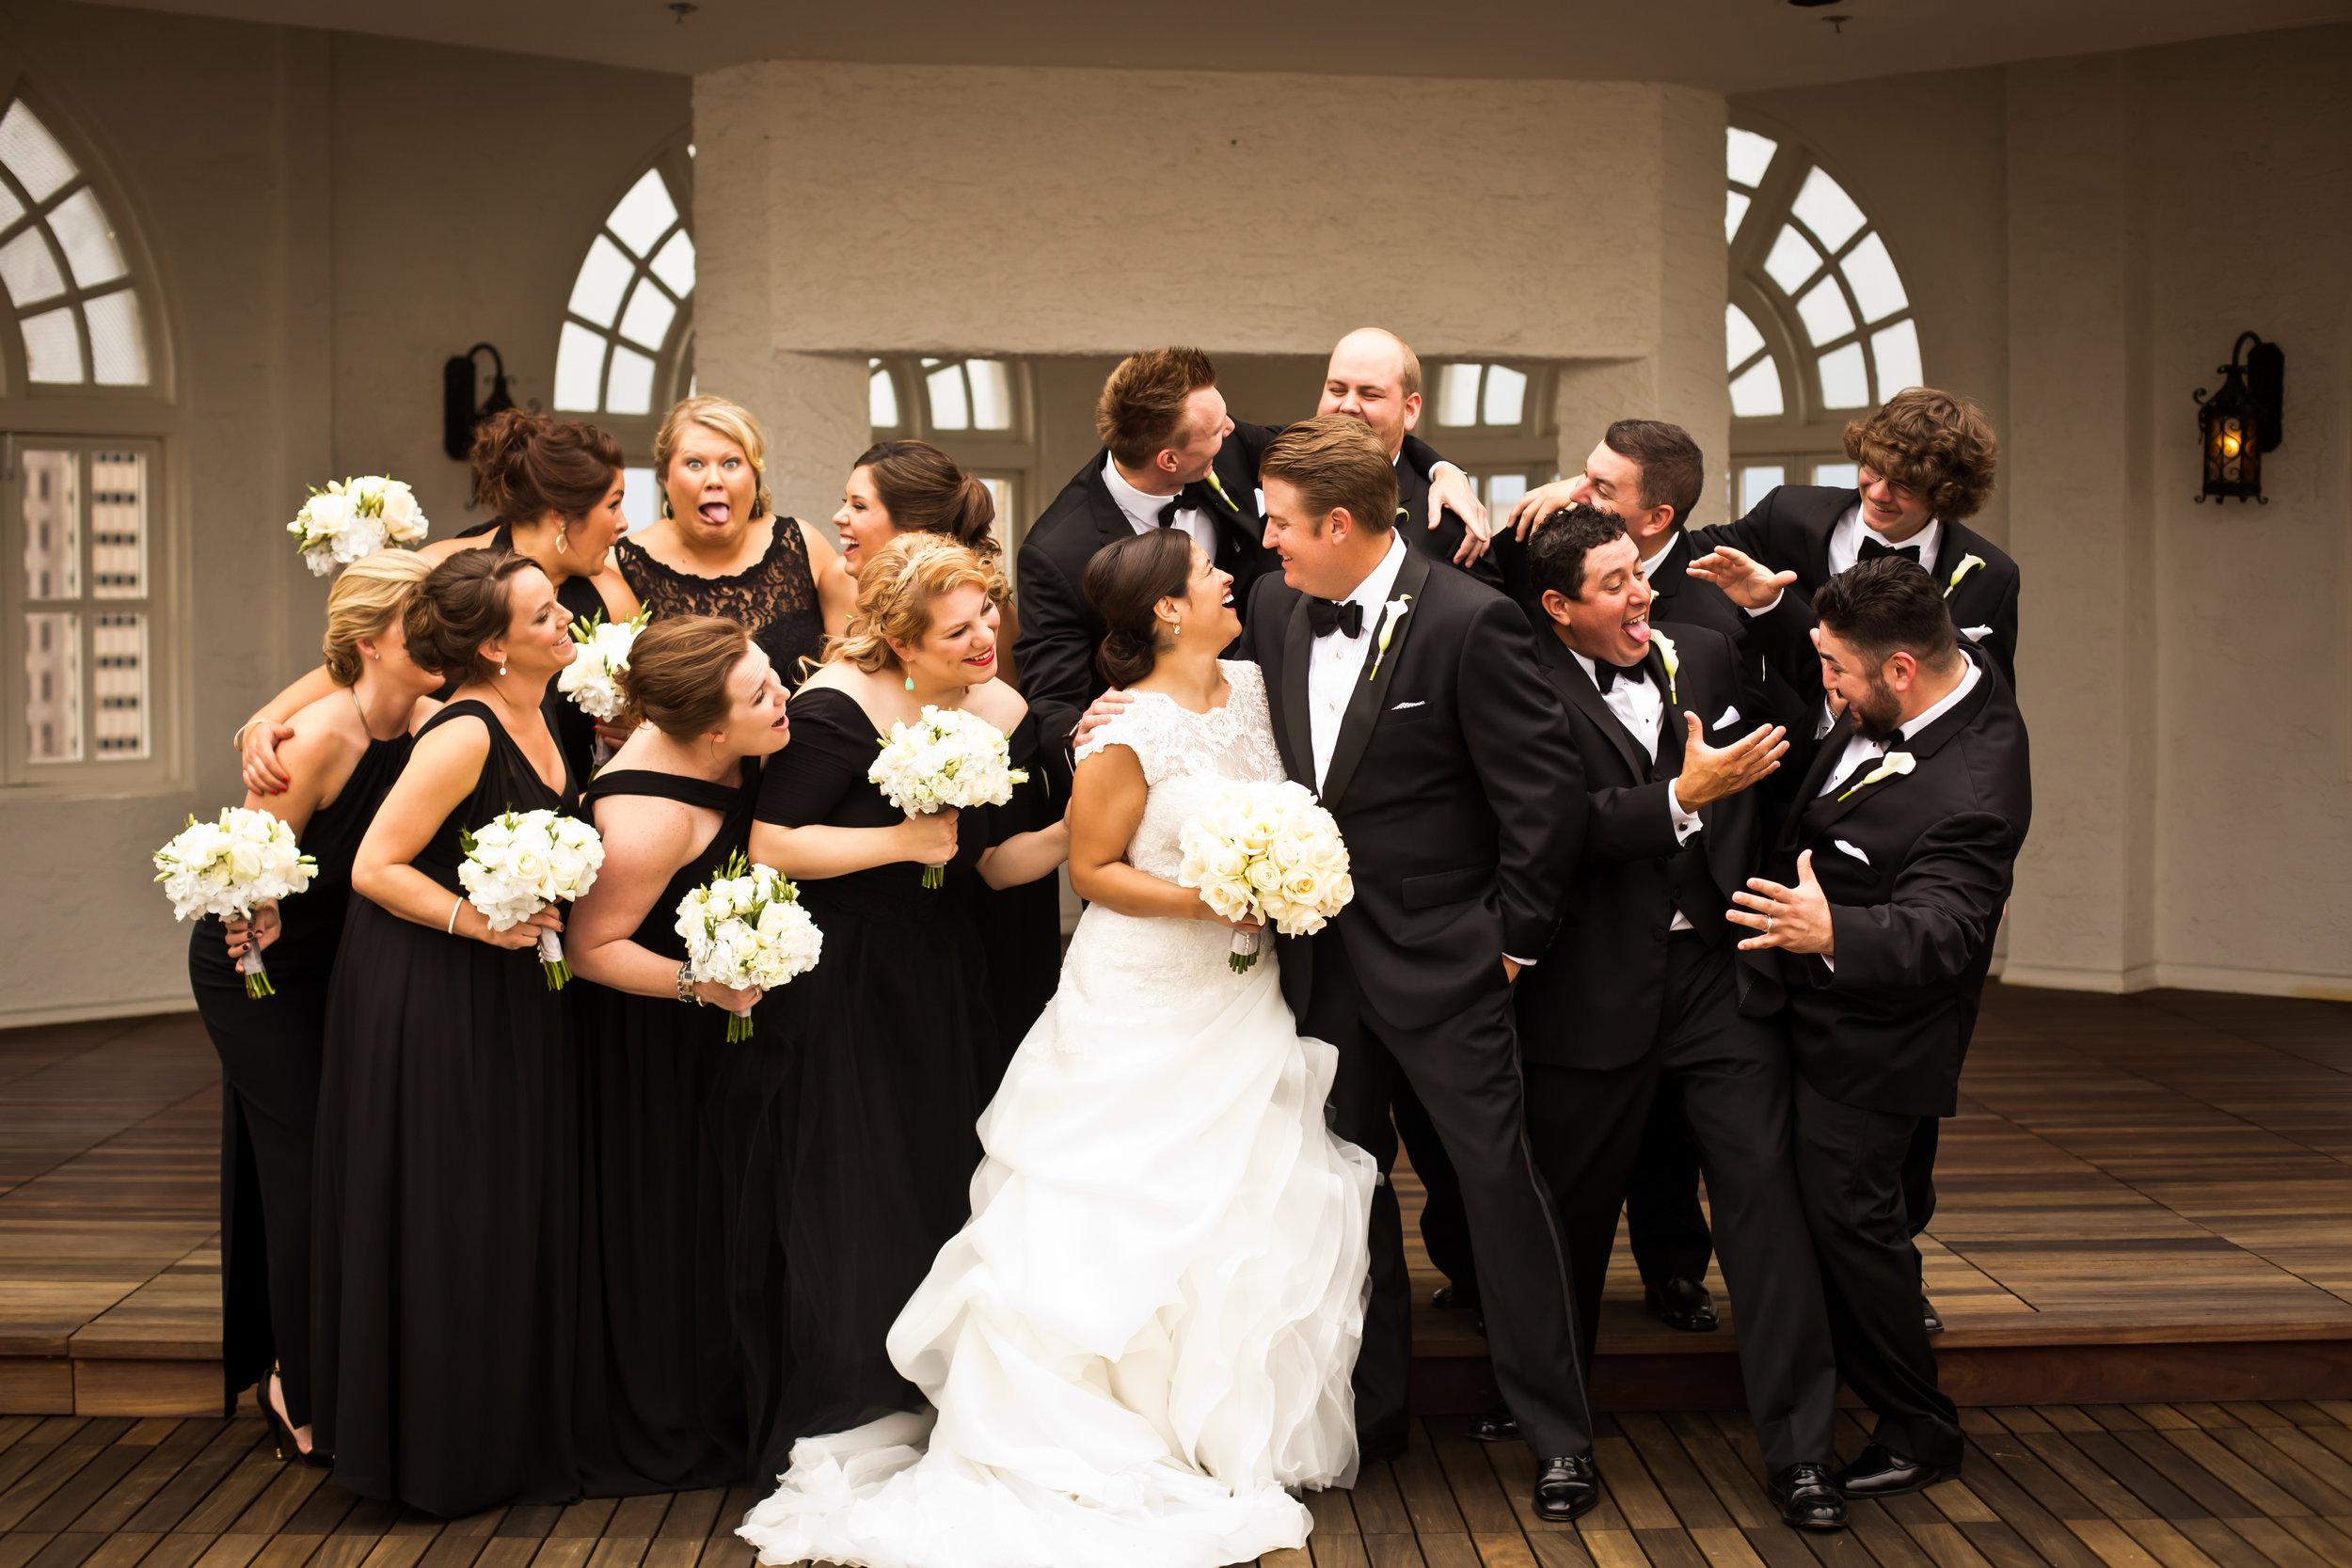 Marble_Falls_Horseshoe_Bay_Photographer_Torres_Wedding_28.jpg